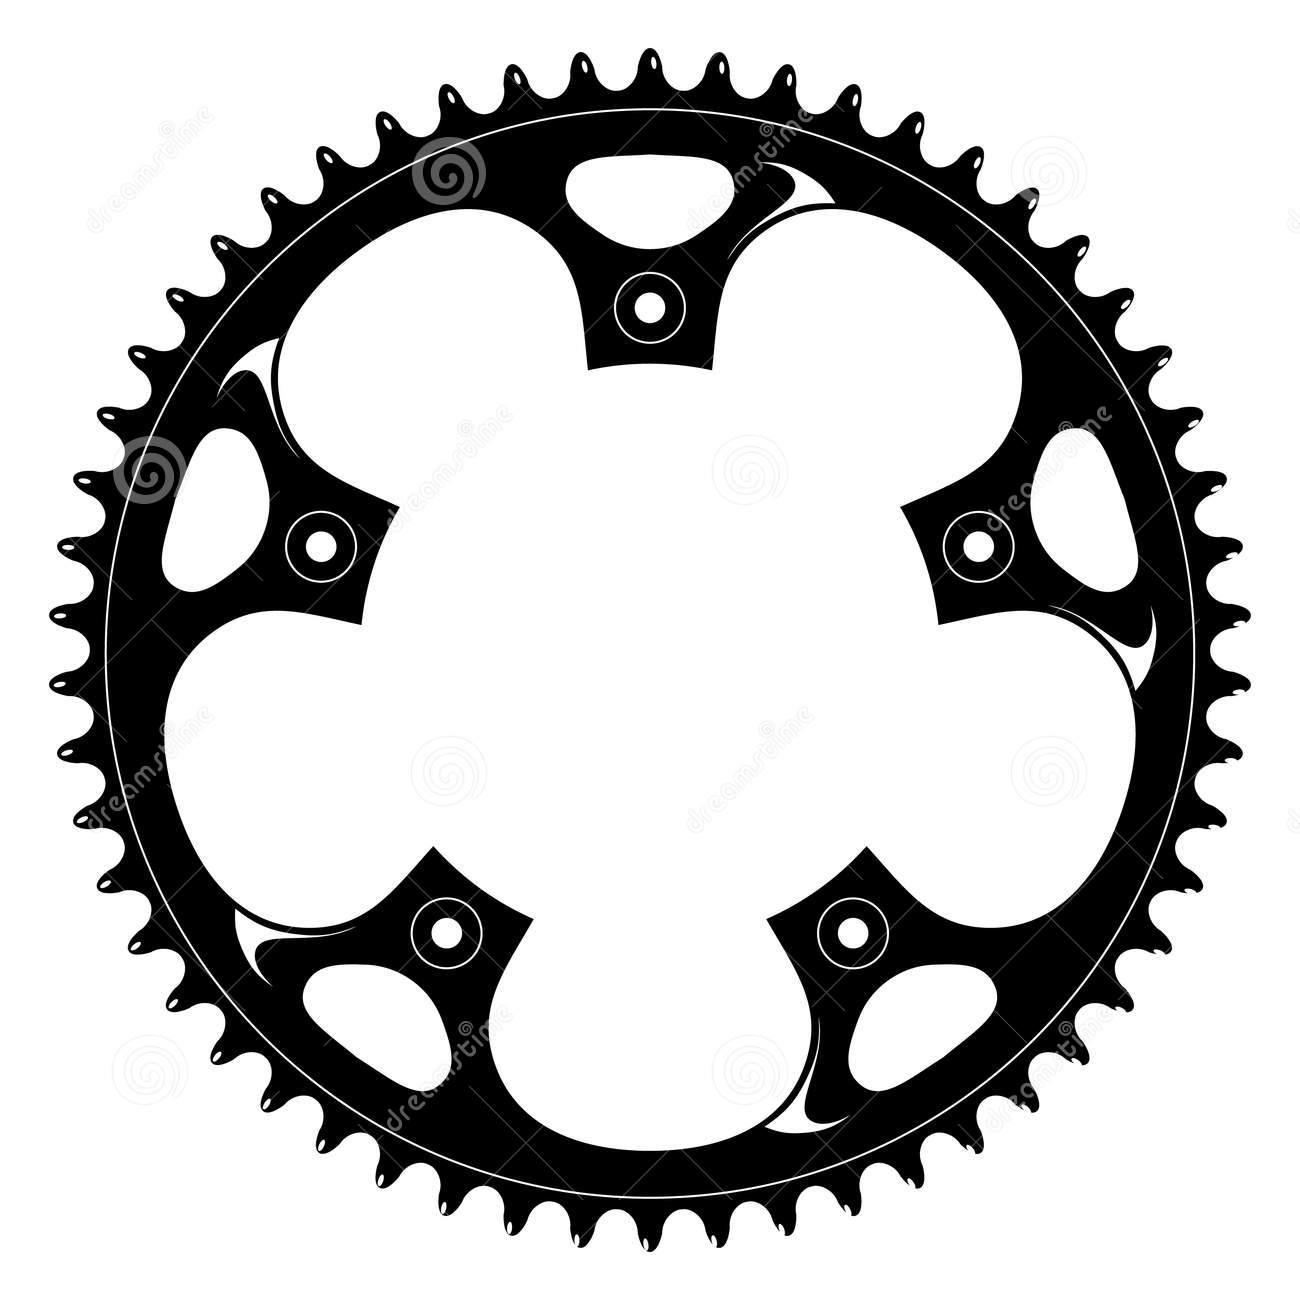 Gears clipart bicycle gear Silhouette gear bike Search tutorial